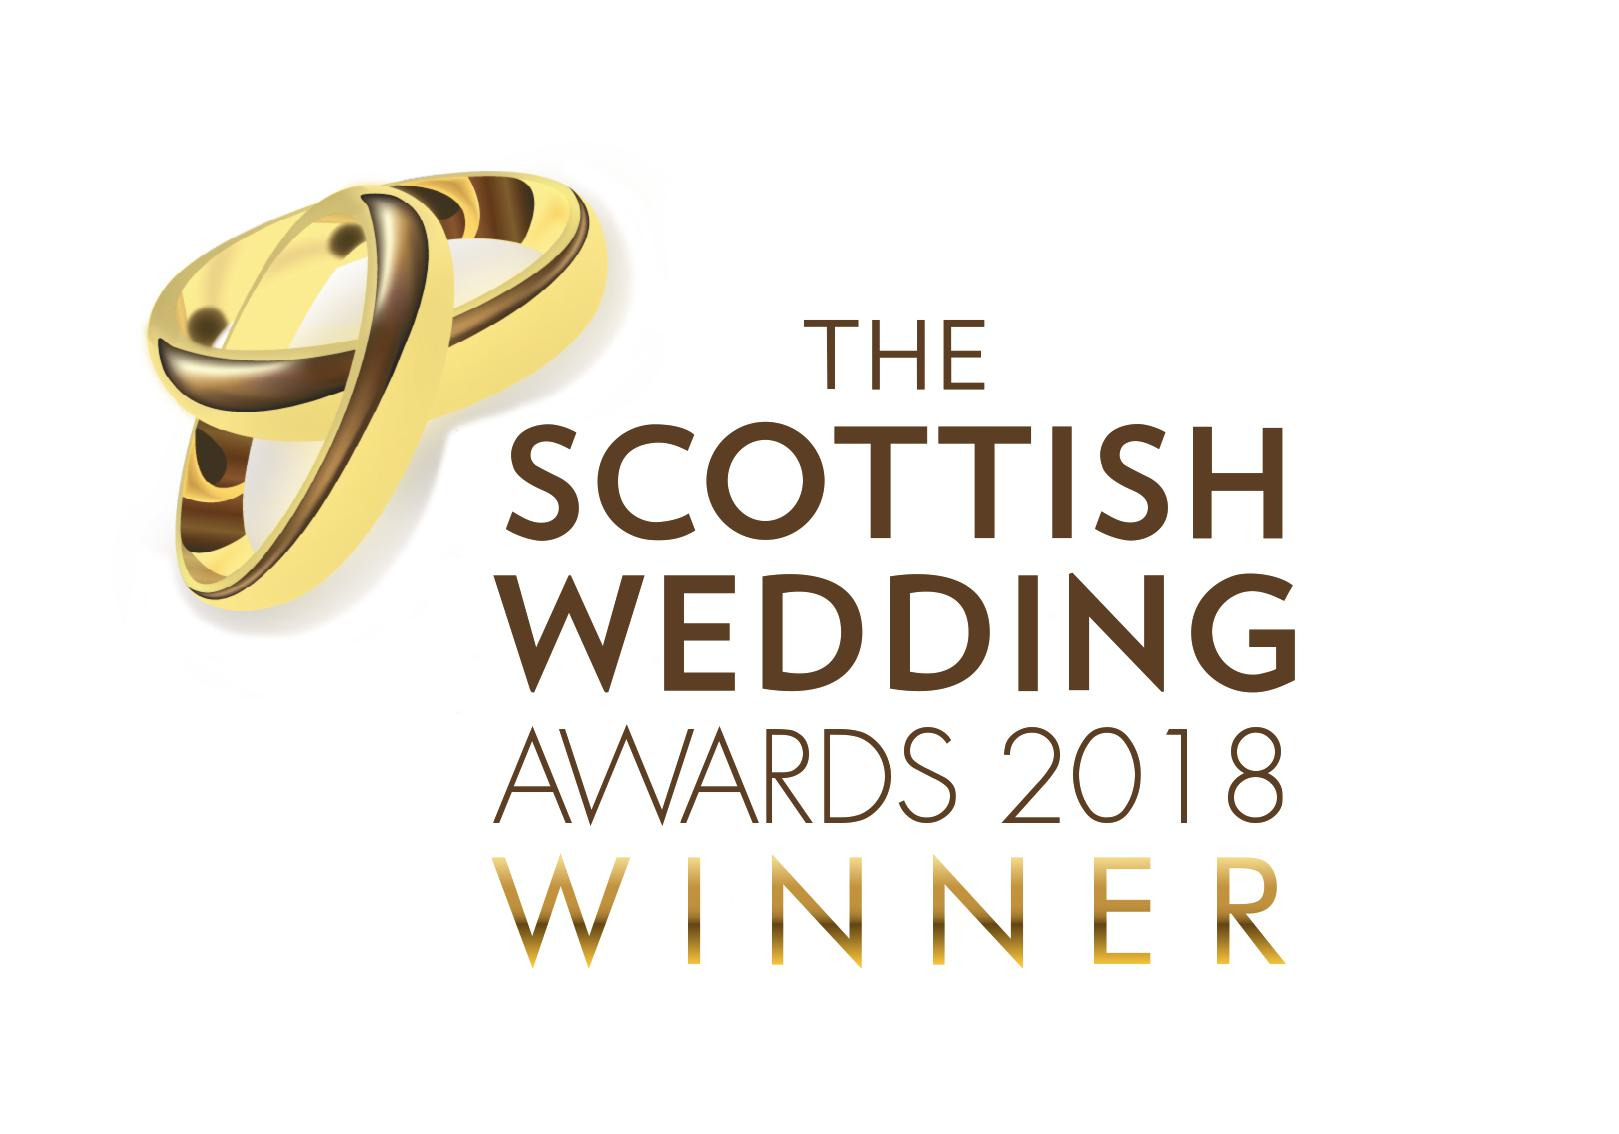 Overall Winner - The Scottish Wedding Awards 2018